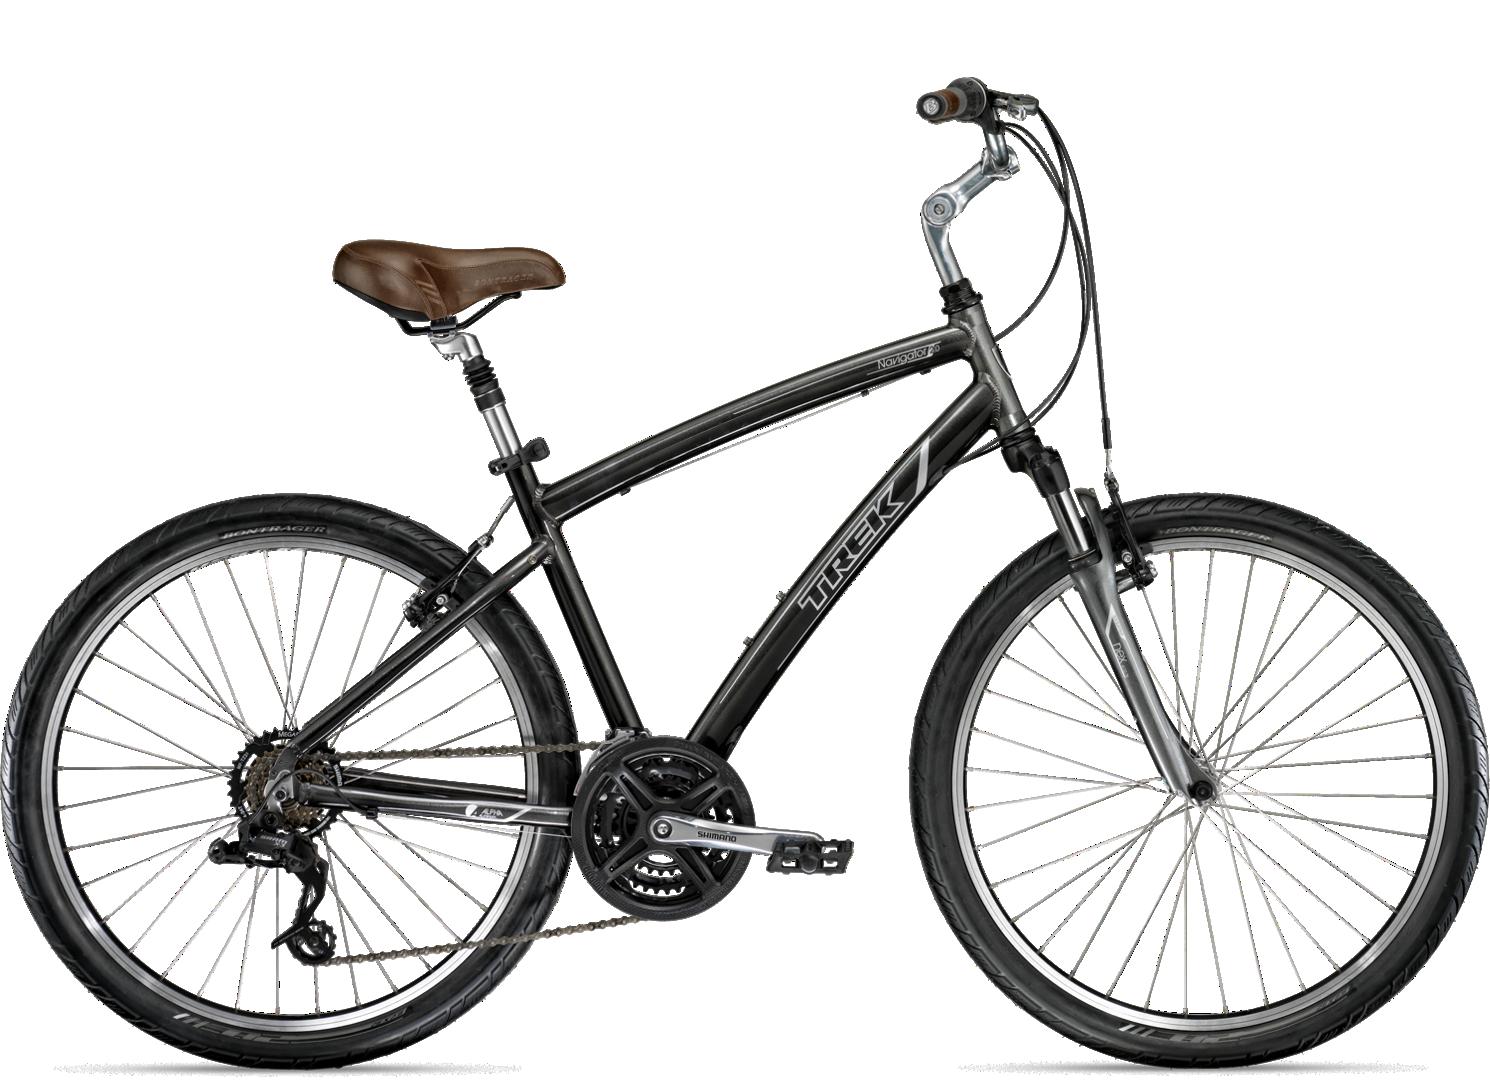 2012 Navigator 2 0 Bike Archive Trek Bicycle